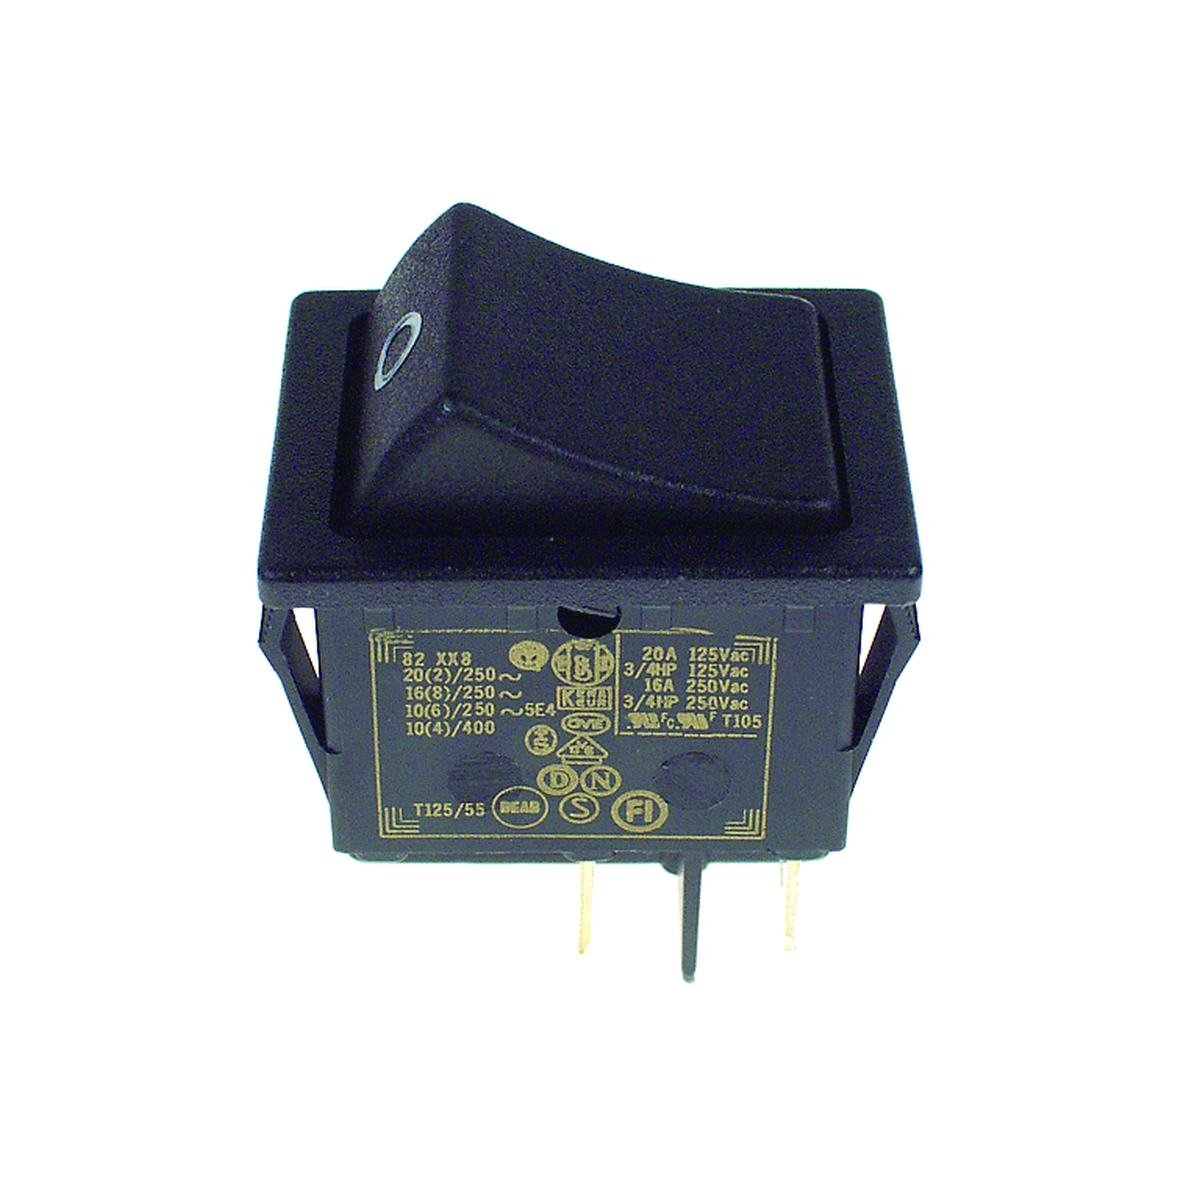 Dobbeltafbryder sort 30 x 22 mm. hulmål